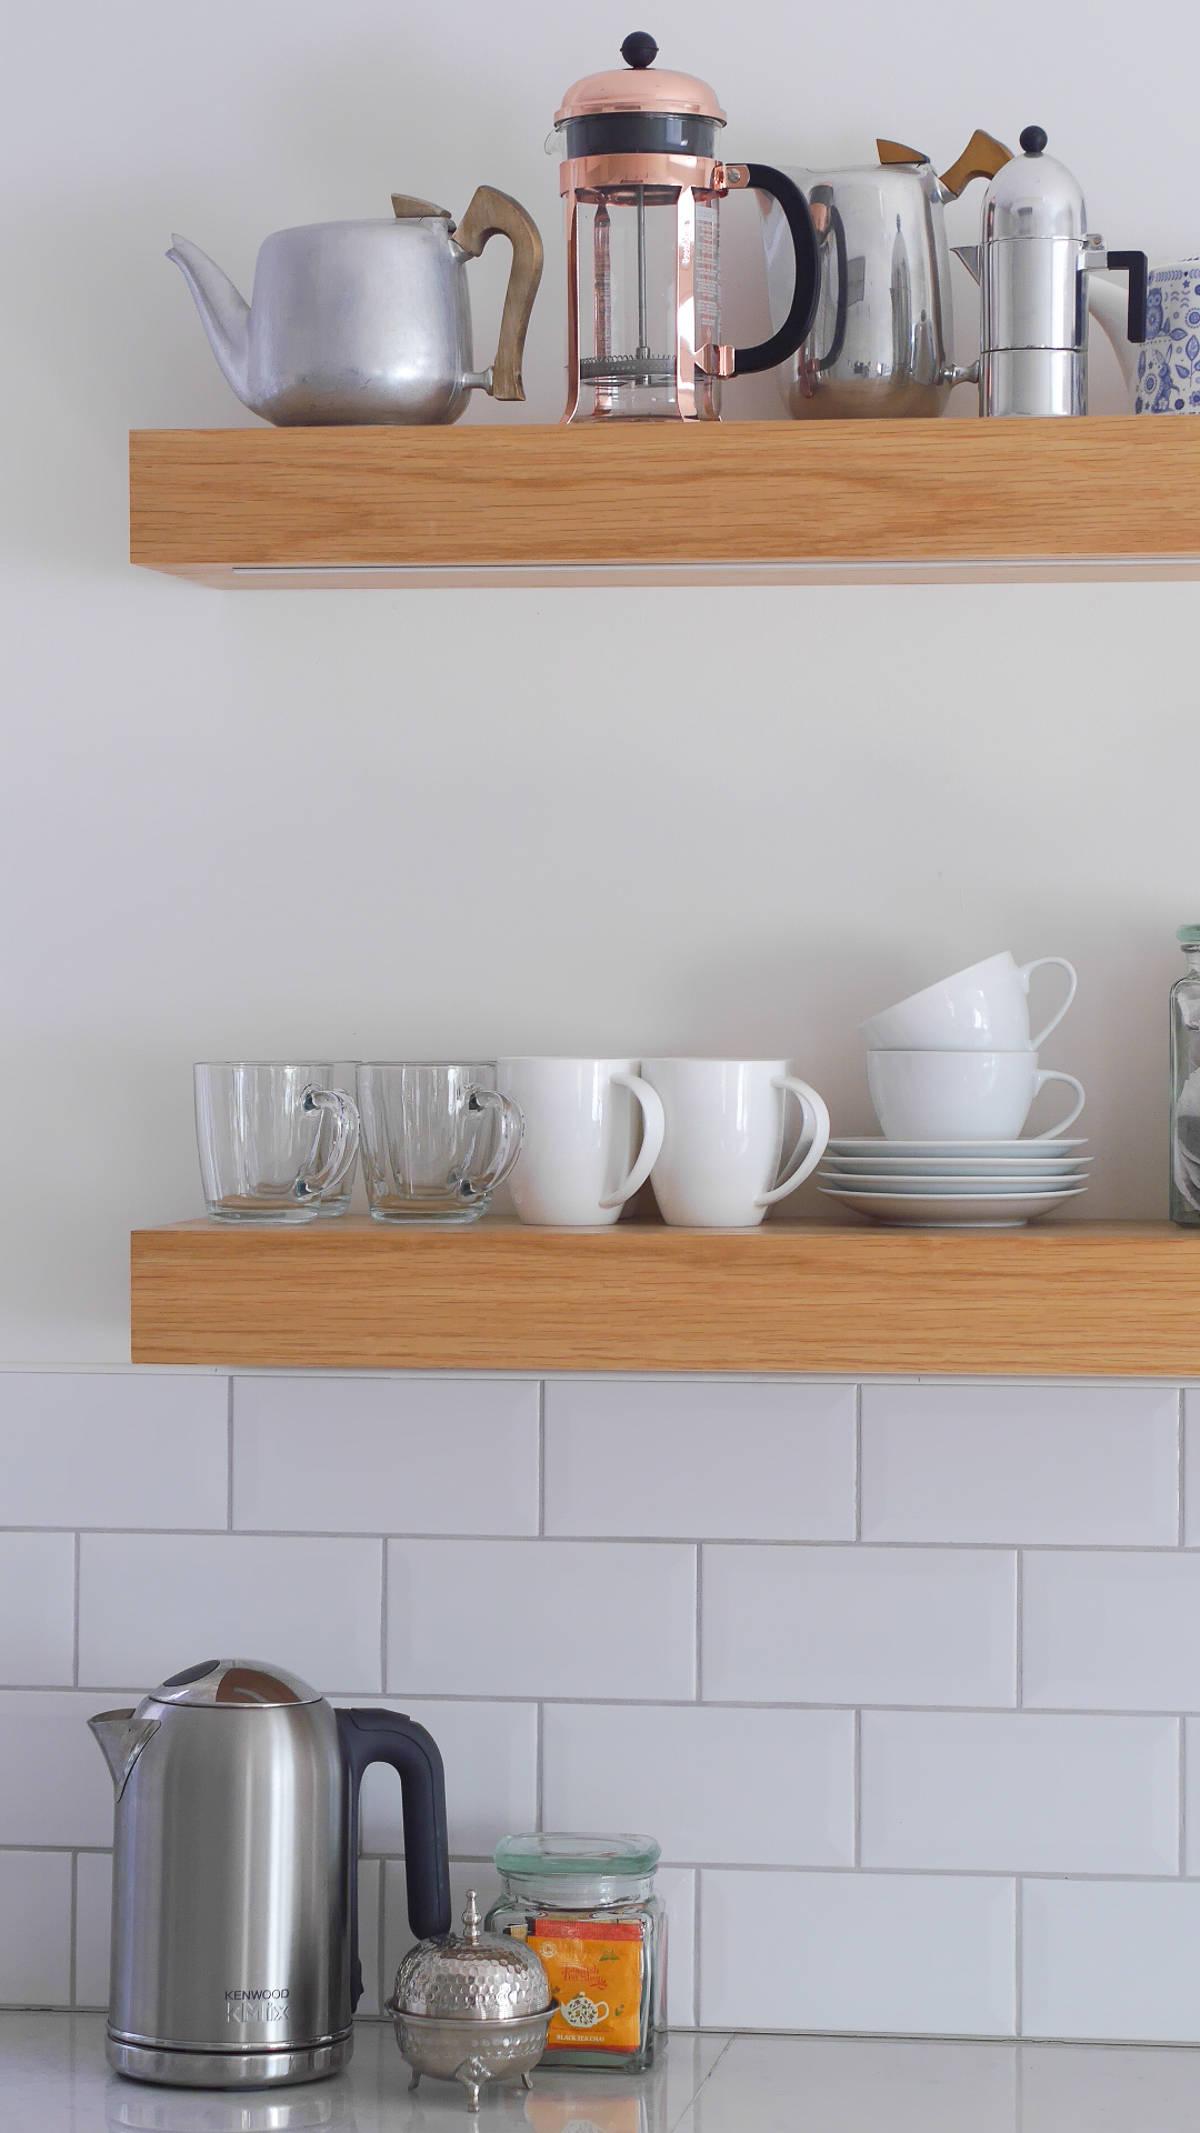 3 ways to style open kitchen shelves